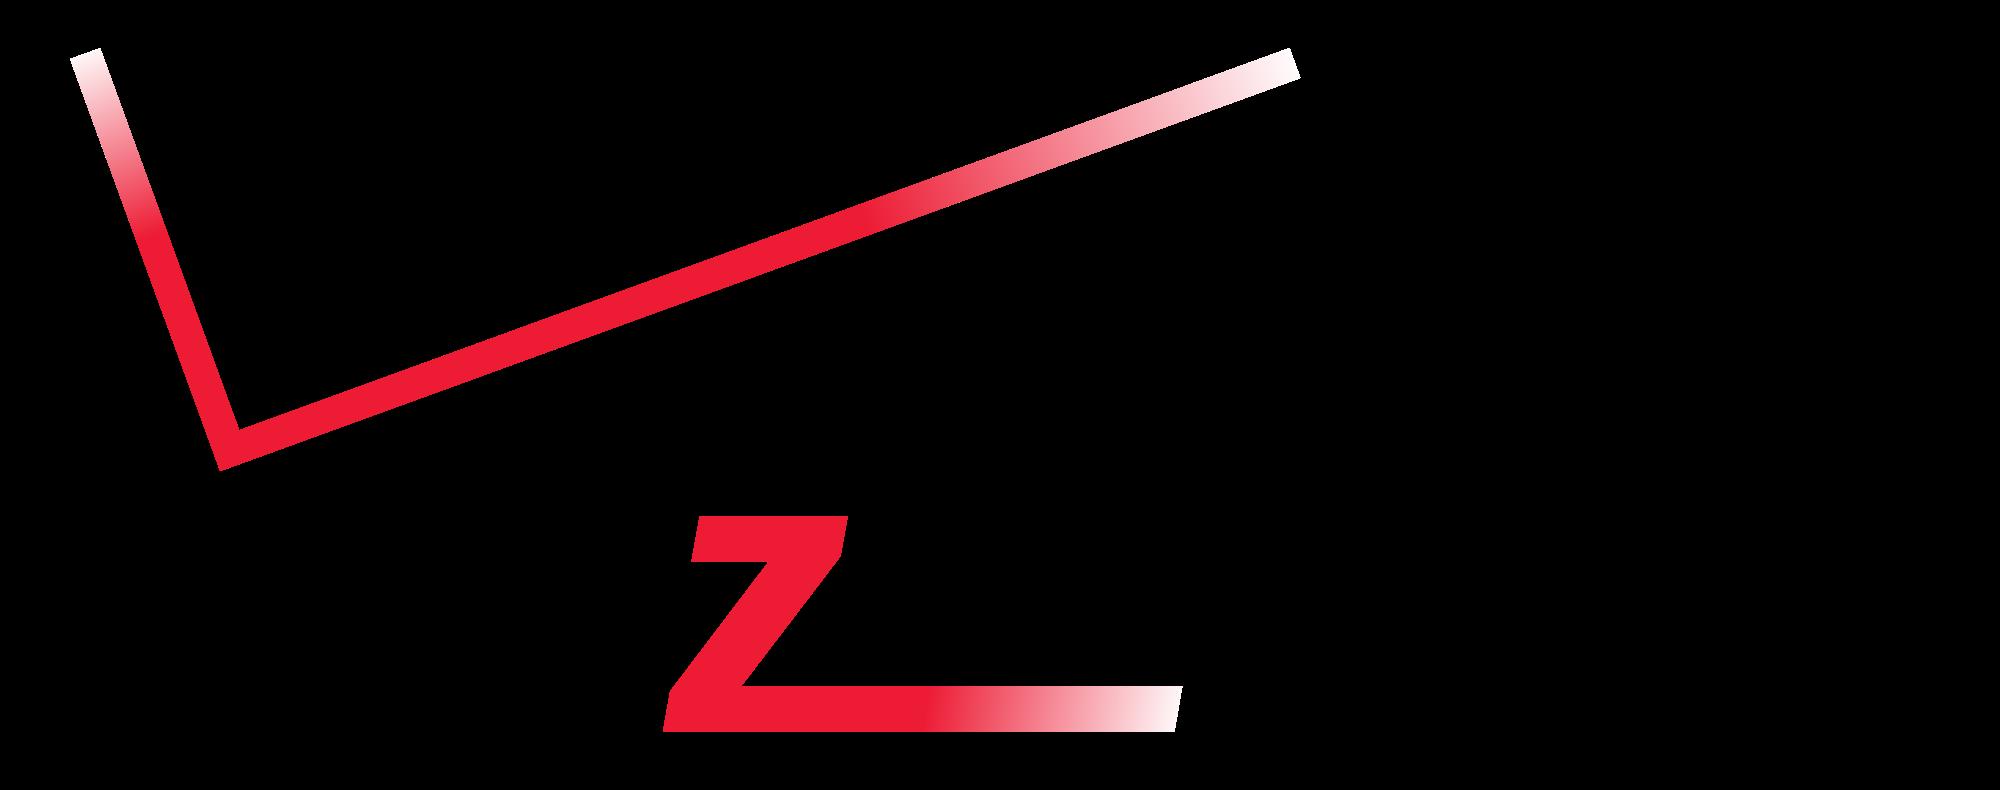 Verizon logo - Verizon 2015 Logo Vector PNG